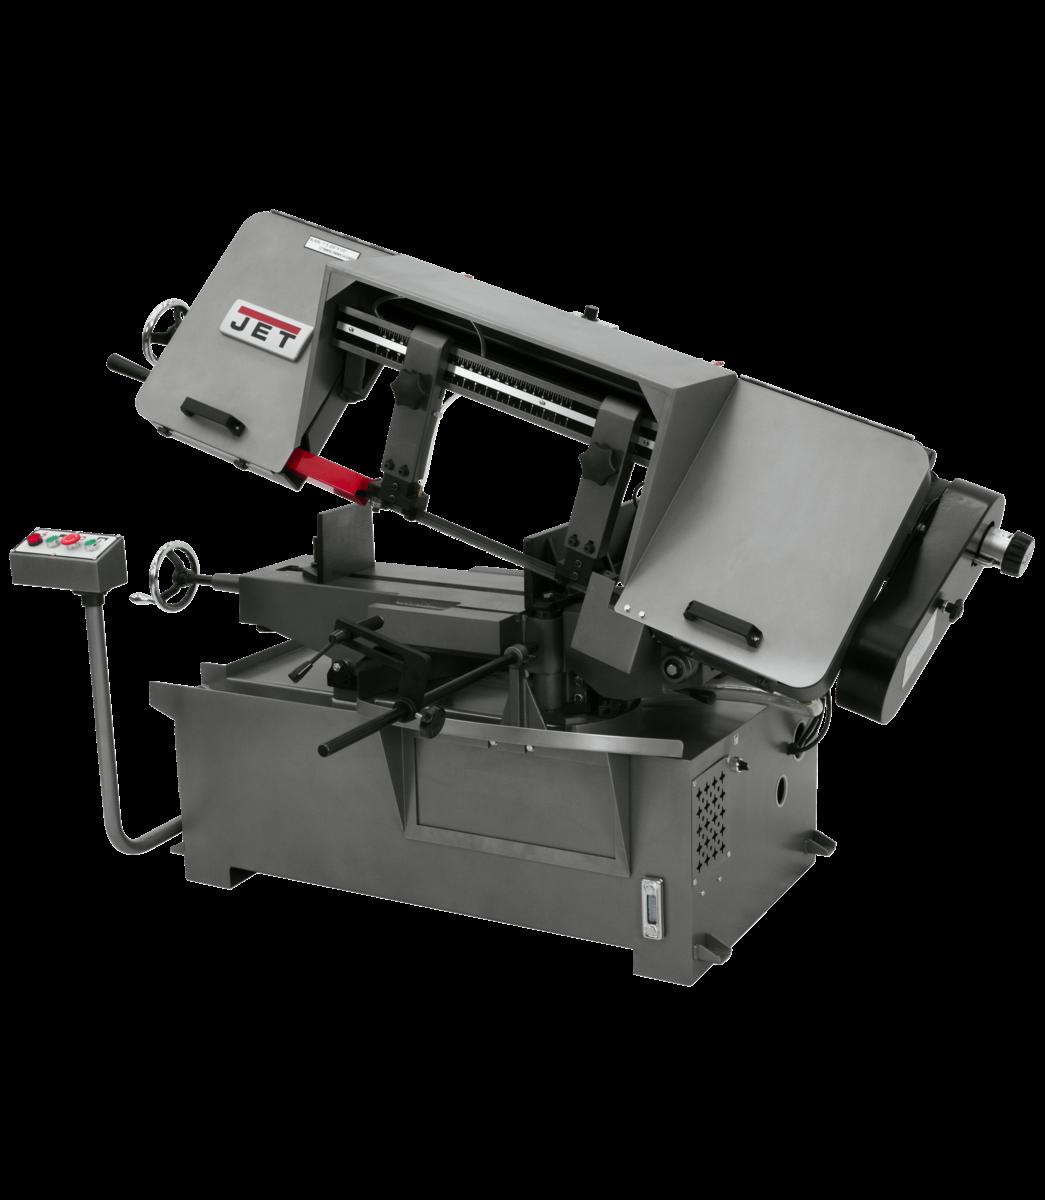 Manual & Semi-Automatic Horizontal Bandsaws